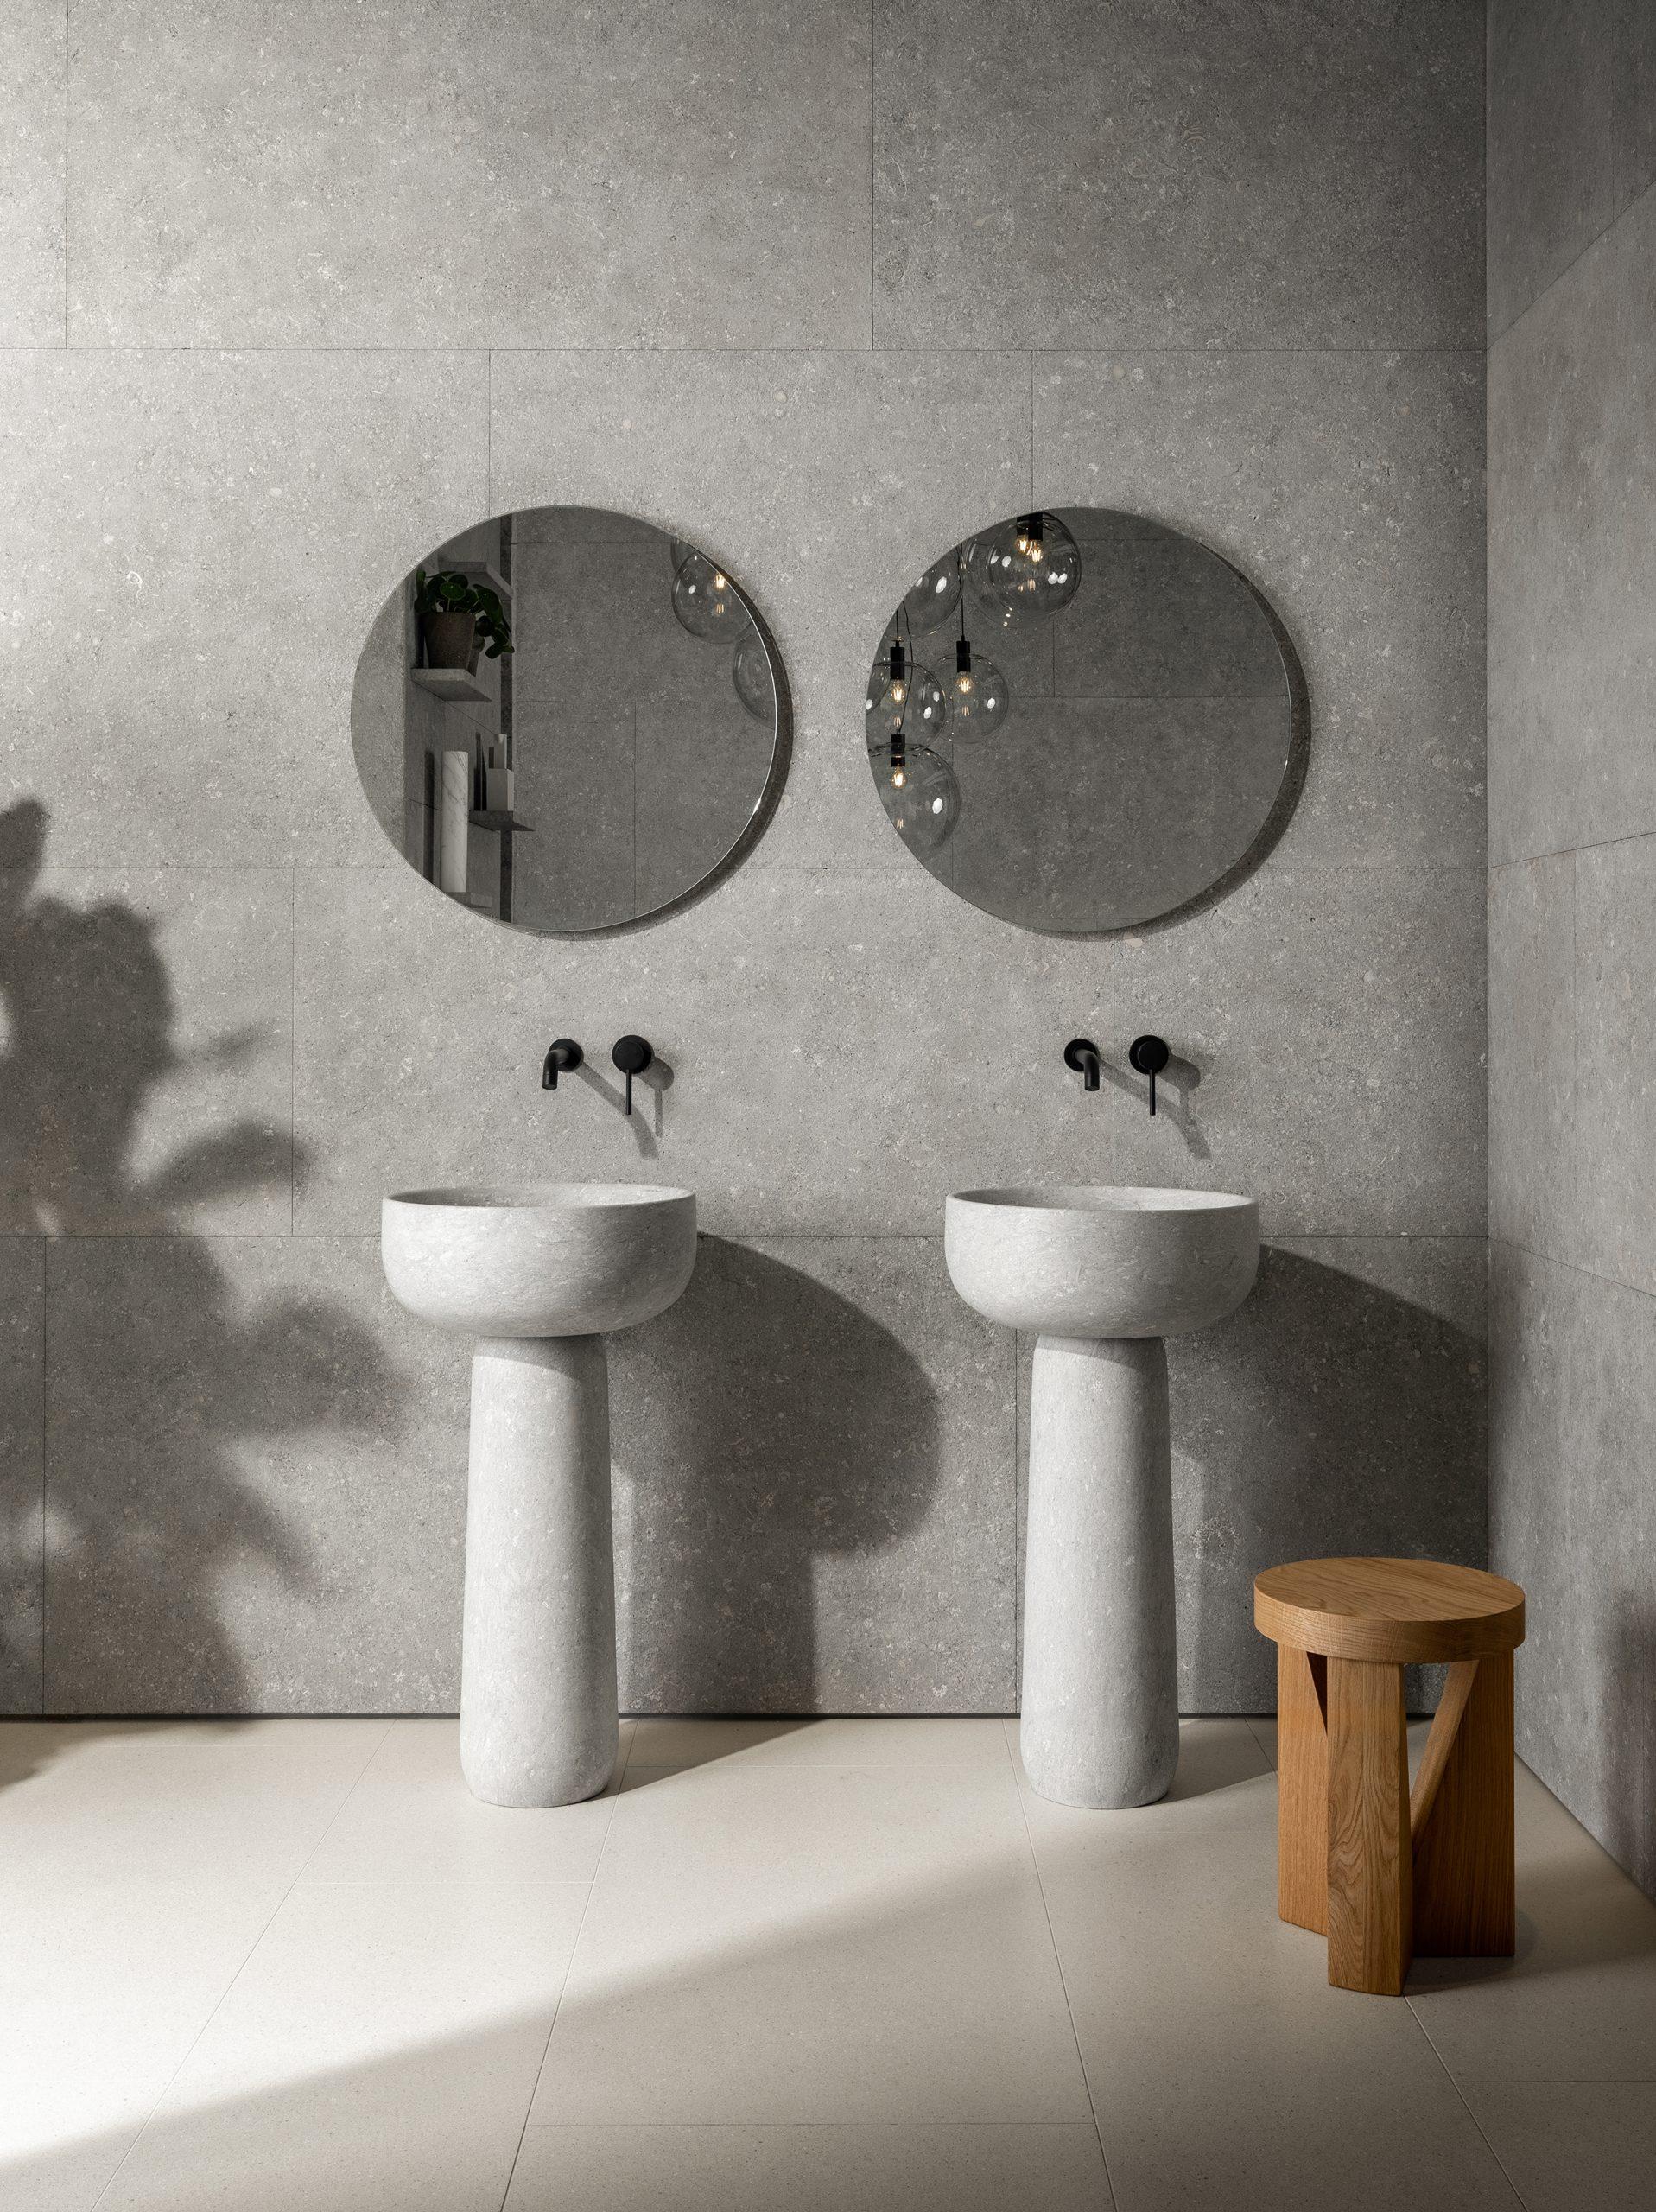 Two freestanding Tetide washbasins in Vicenza stone, designed by Debiasi Sandri for Grassi Pietre